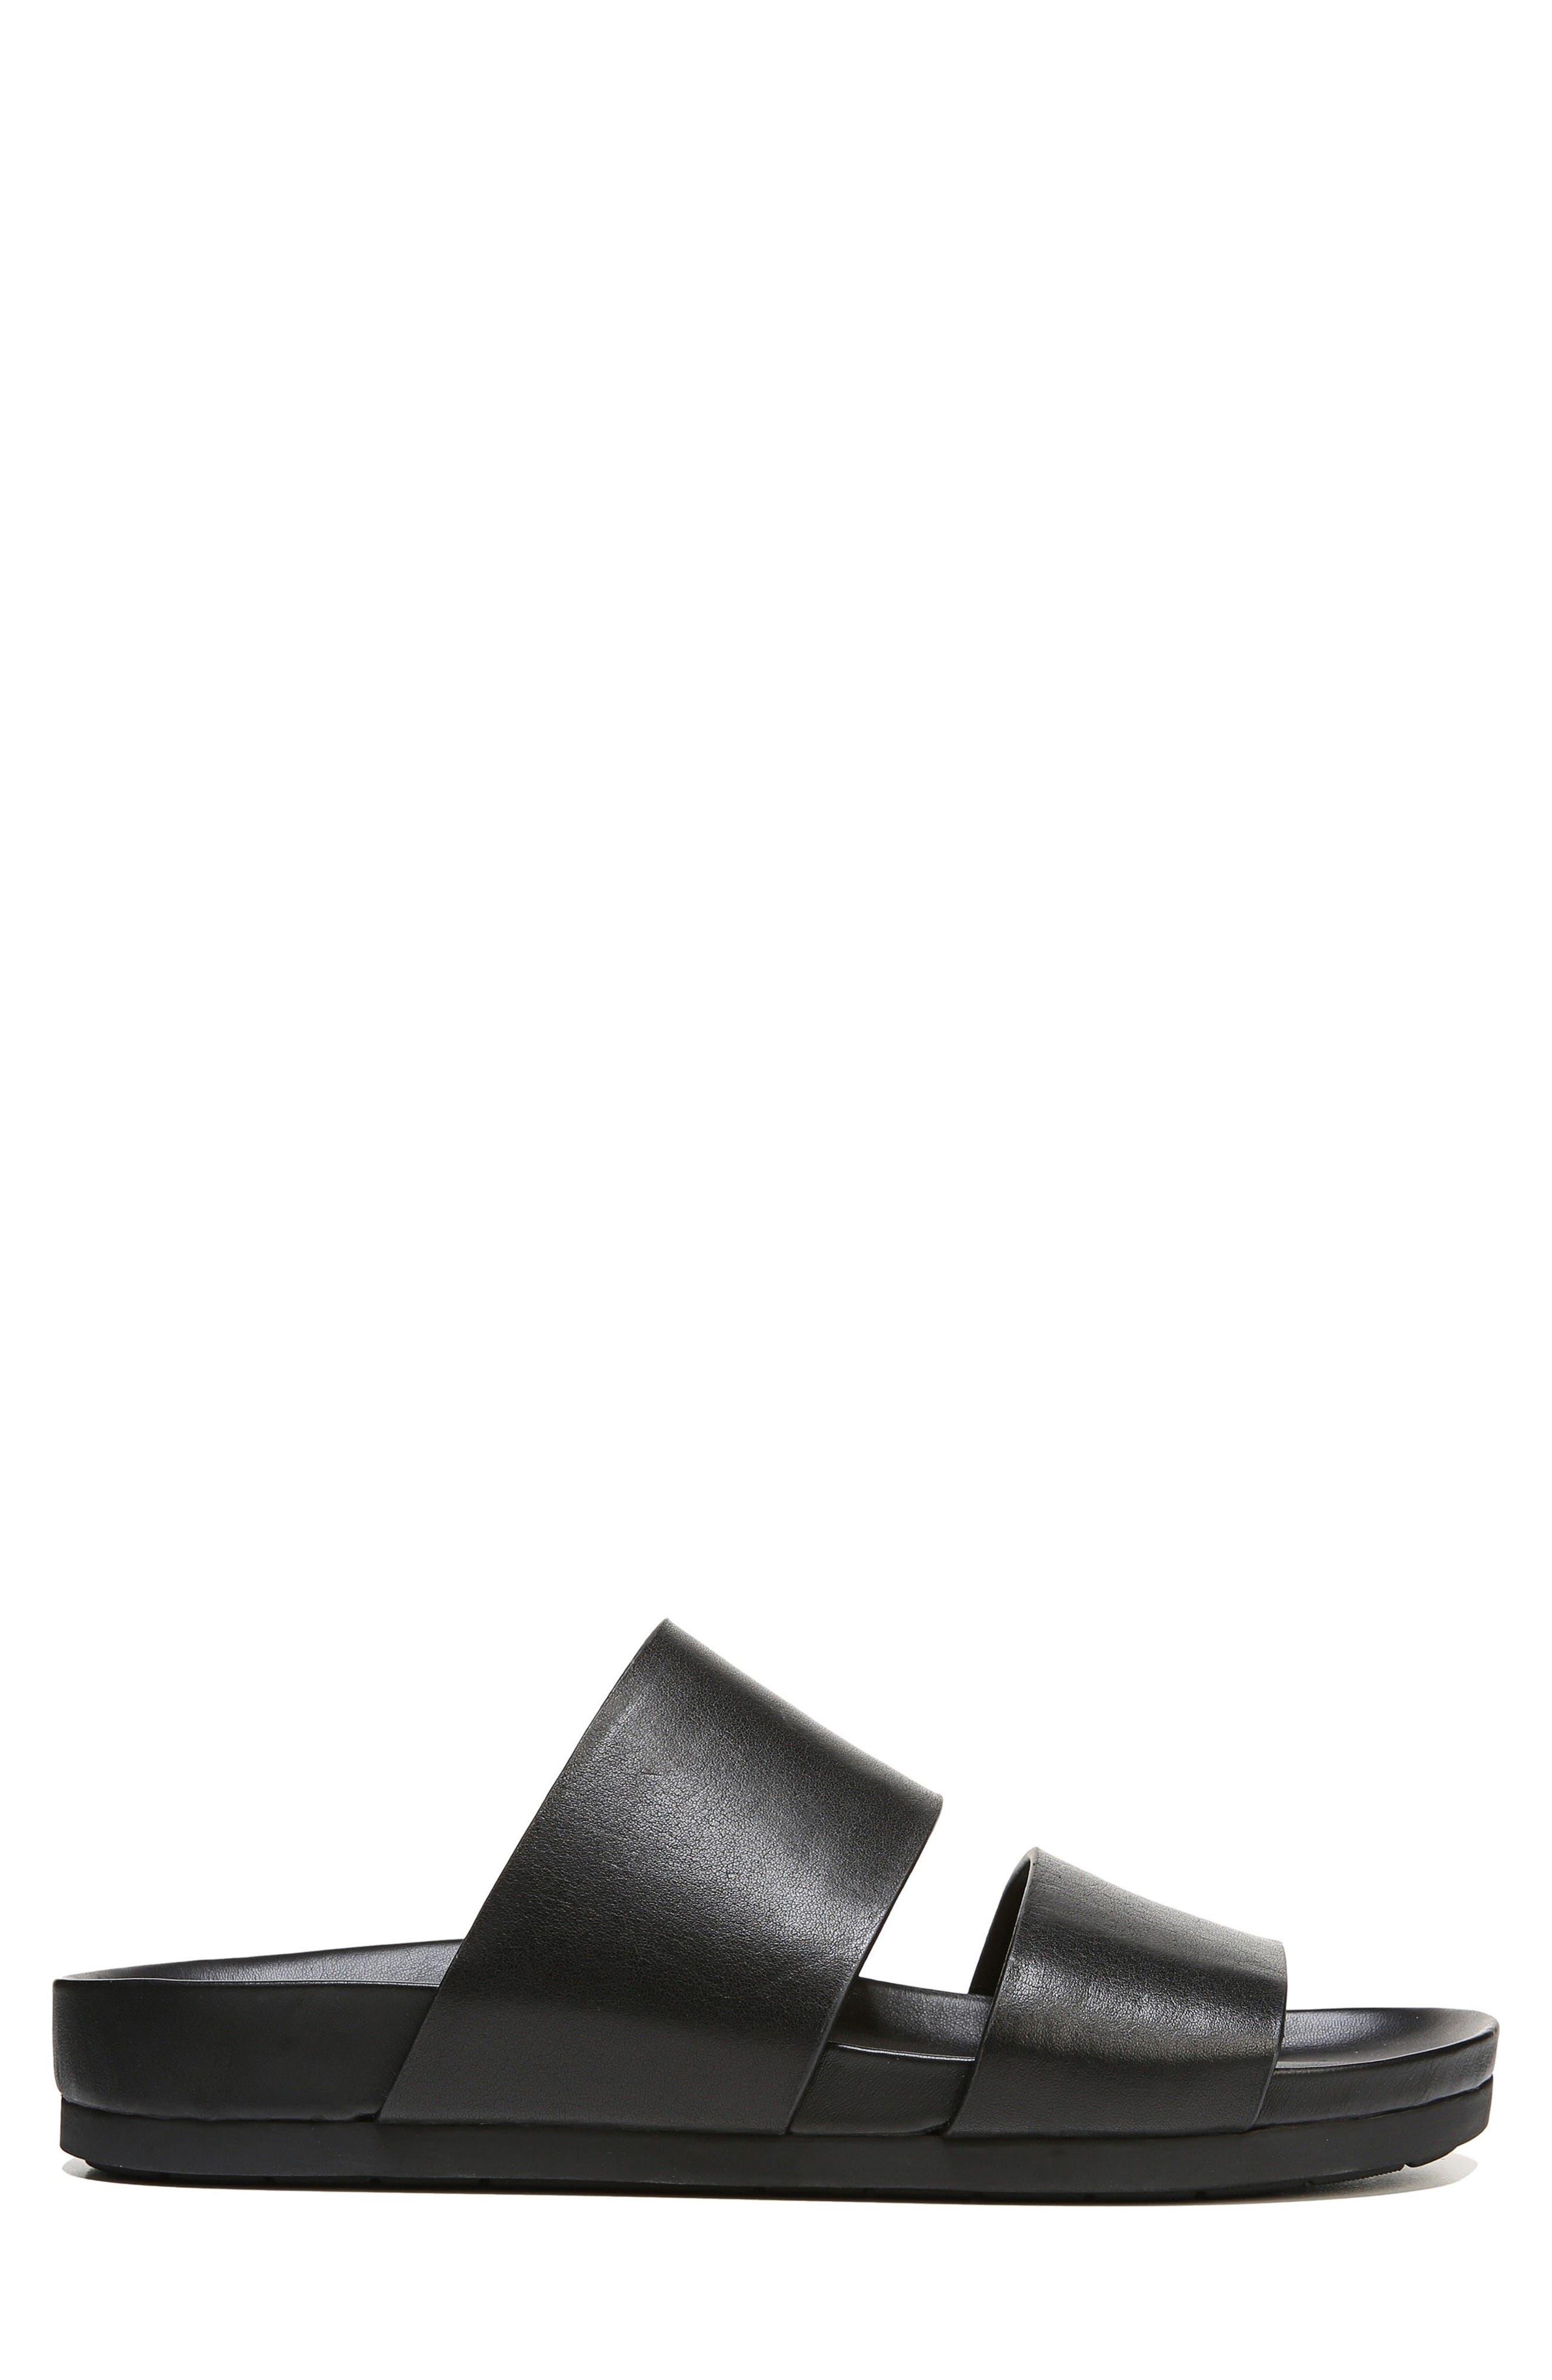 Malibu Slide Sandal,                             Alternate thumbnail 3, color,                             001